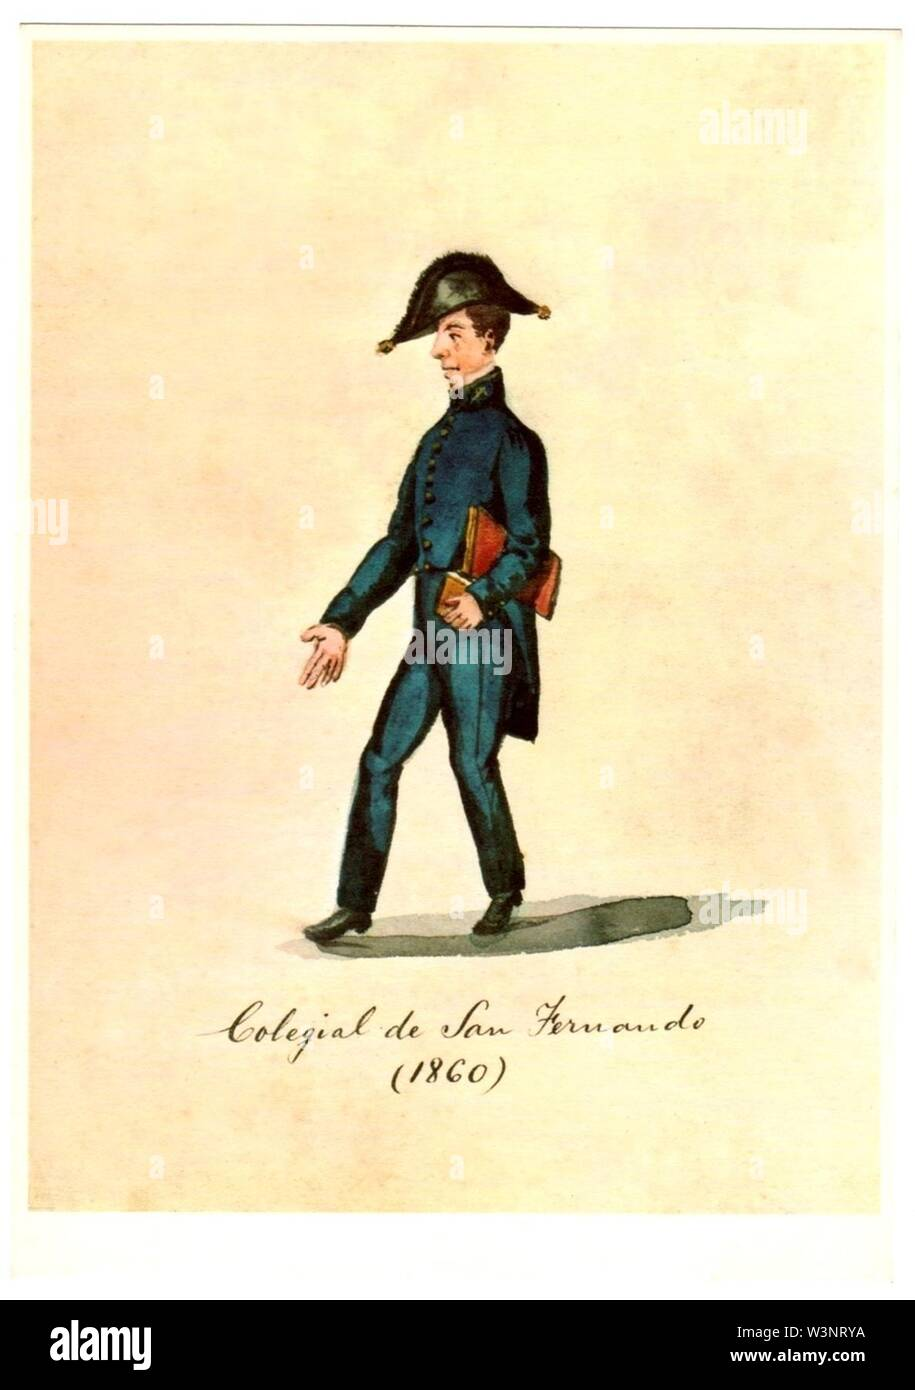 Colegial de San Fernando (1860). Imagen De Stock